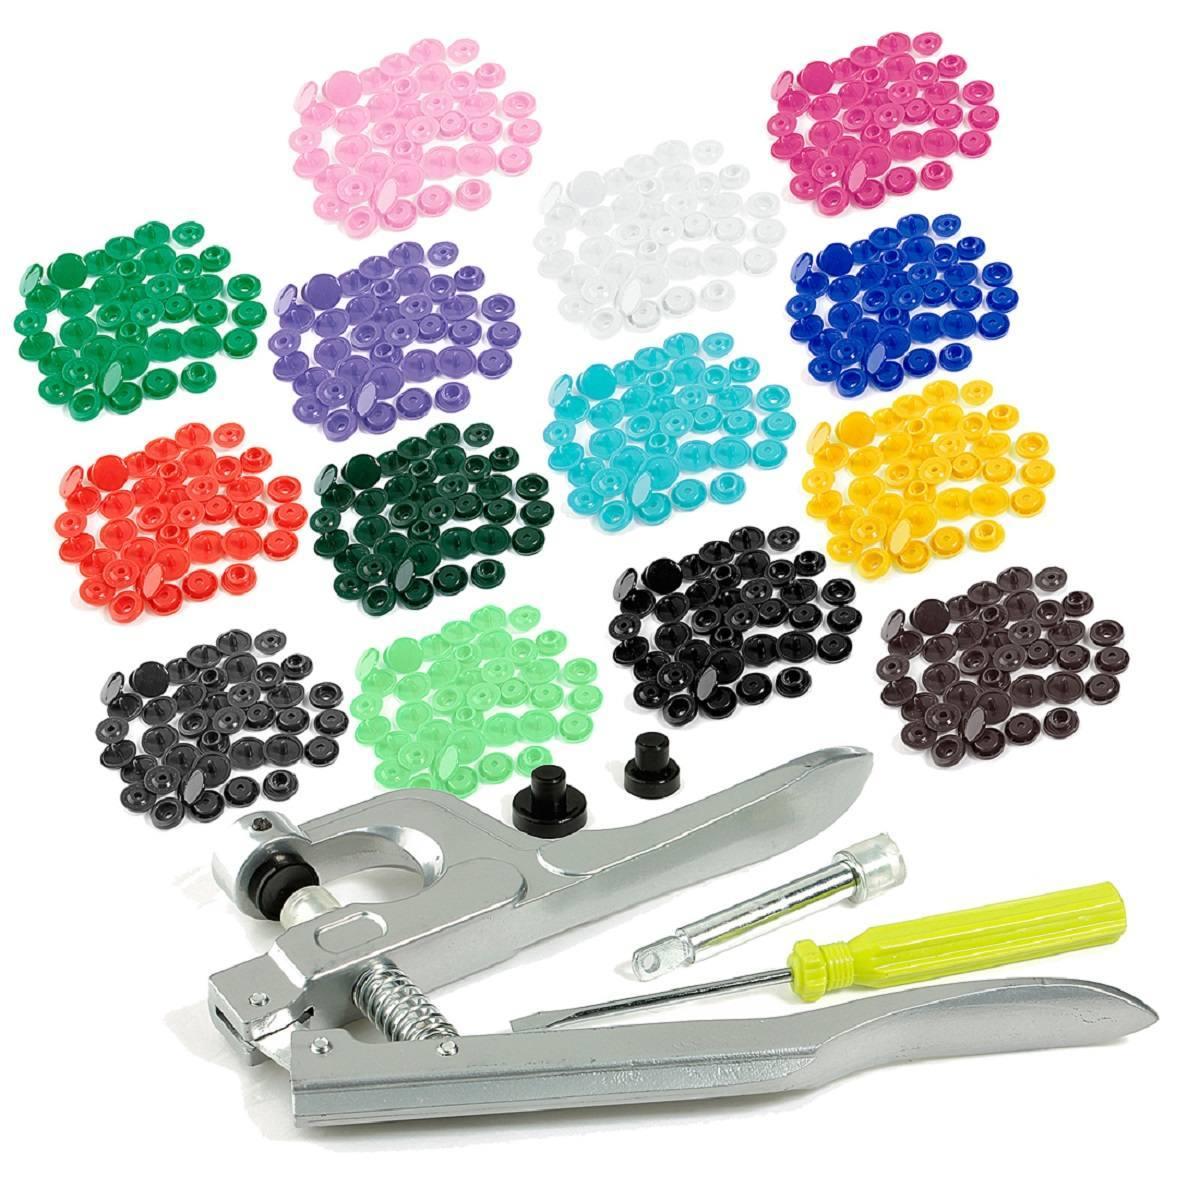 Snap Pince Fastener Press Stud Bouton Fixation Outil de Couture Craft Kit Setter Q